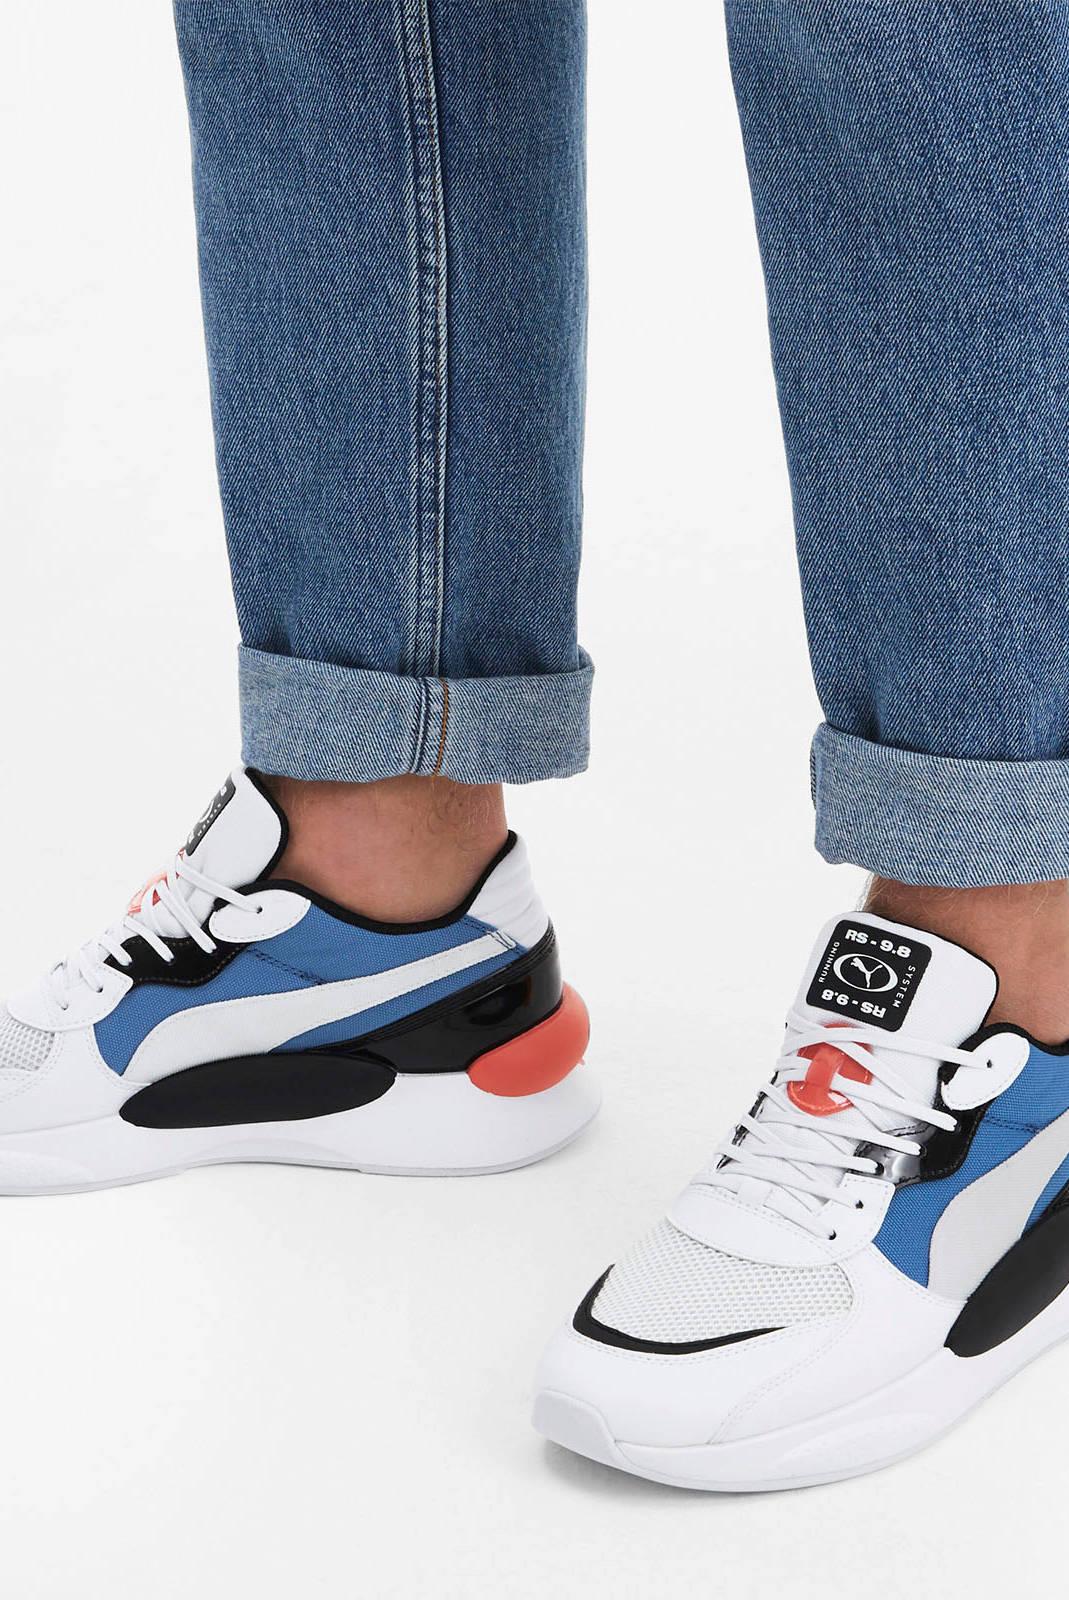 Puma RS 9.8 FRESH sneakers wit | wehkamp